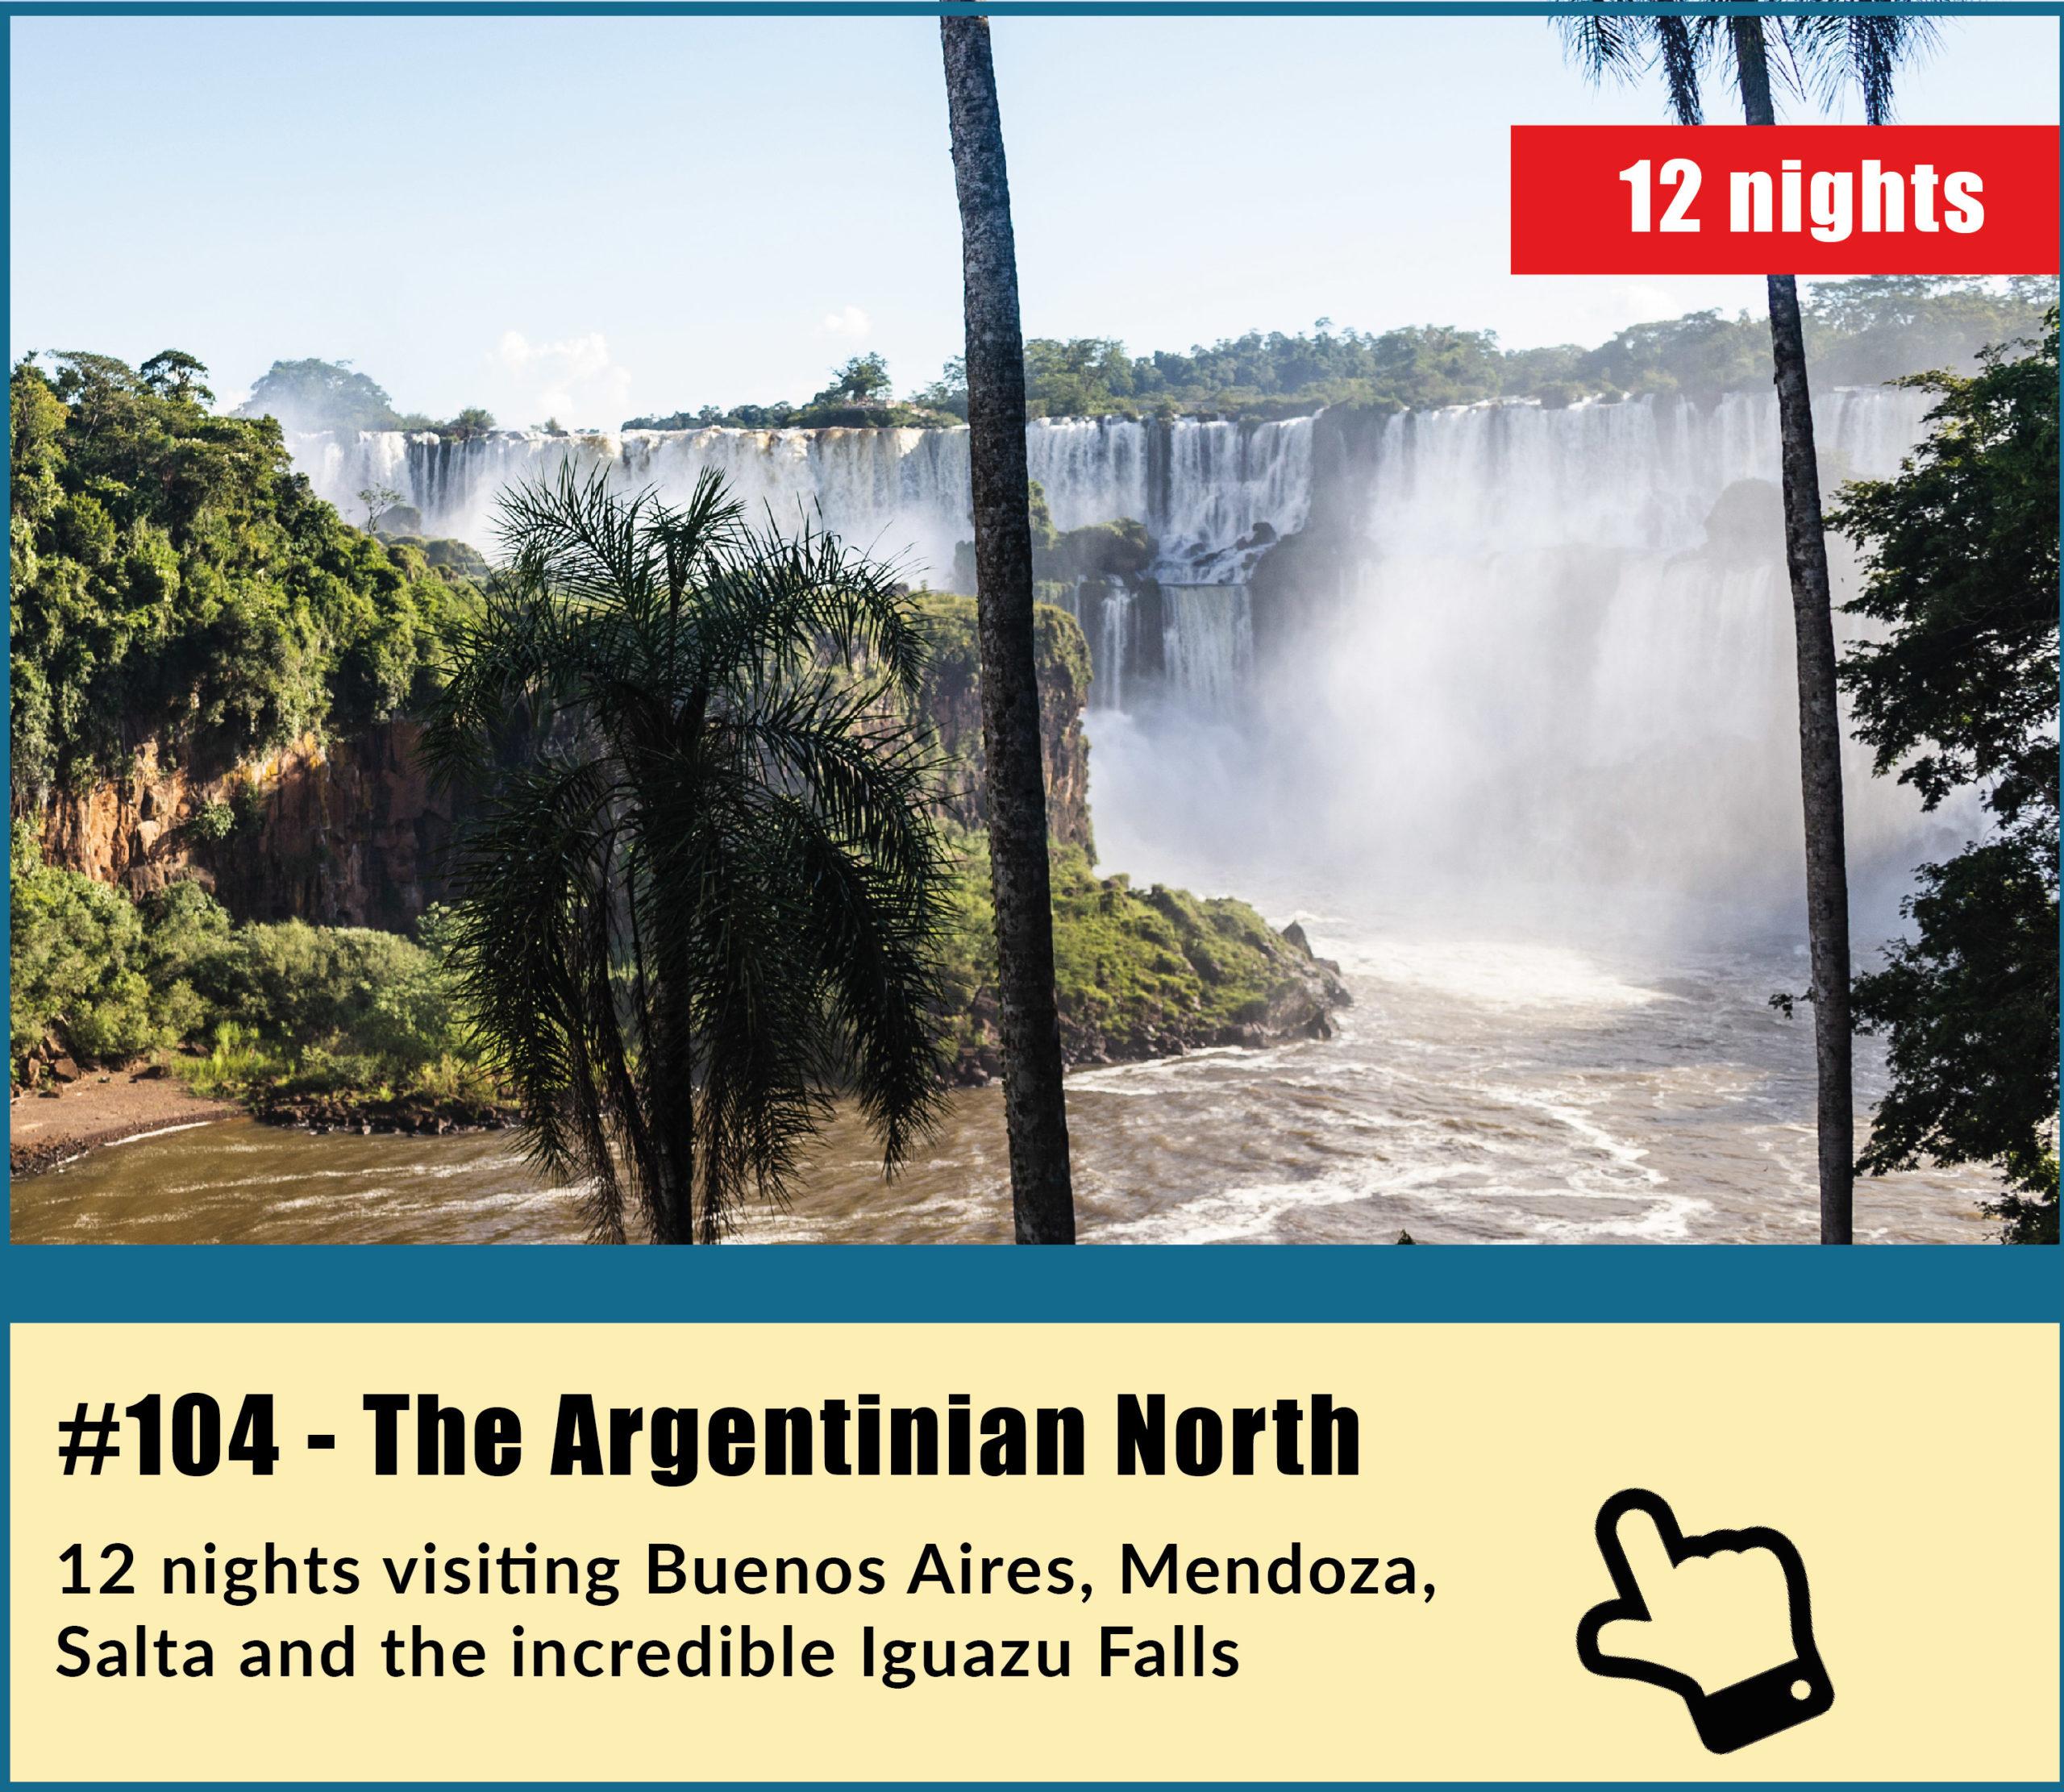 When to visit Mendoza?